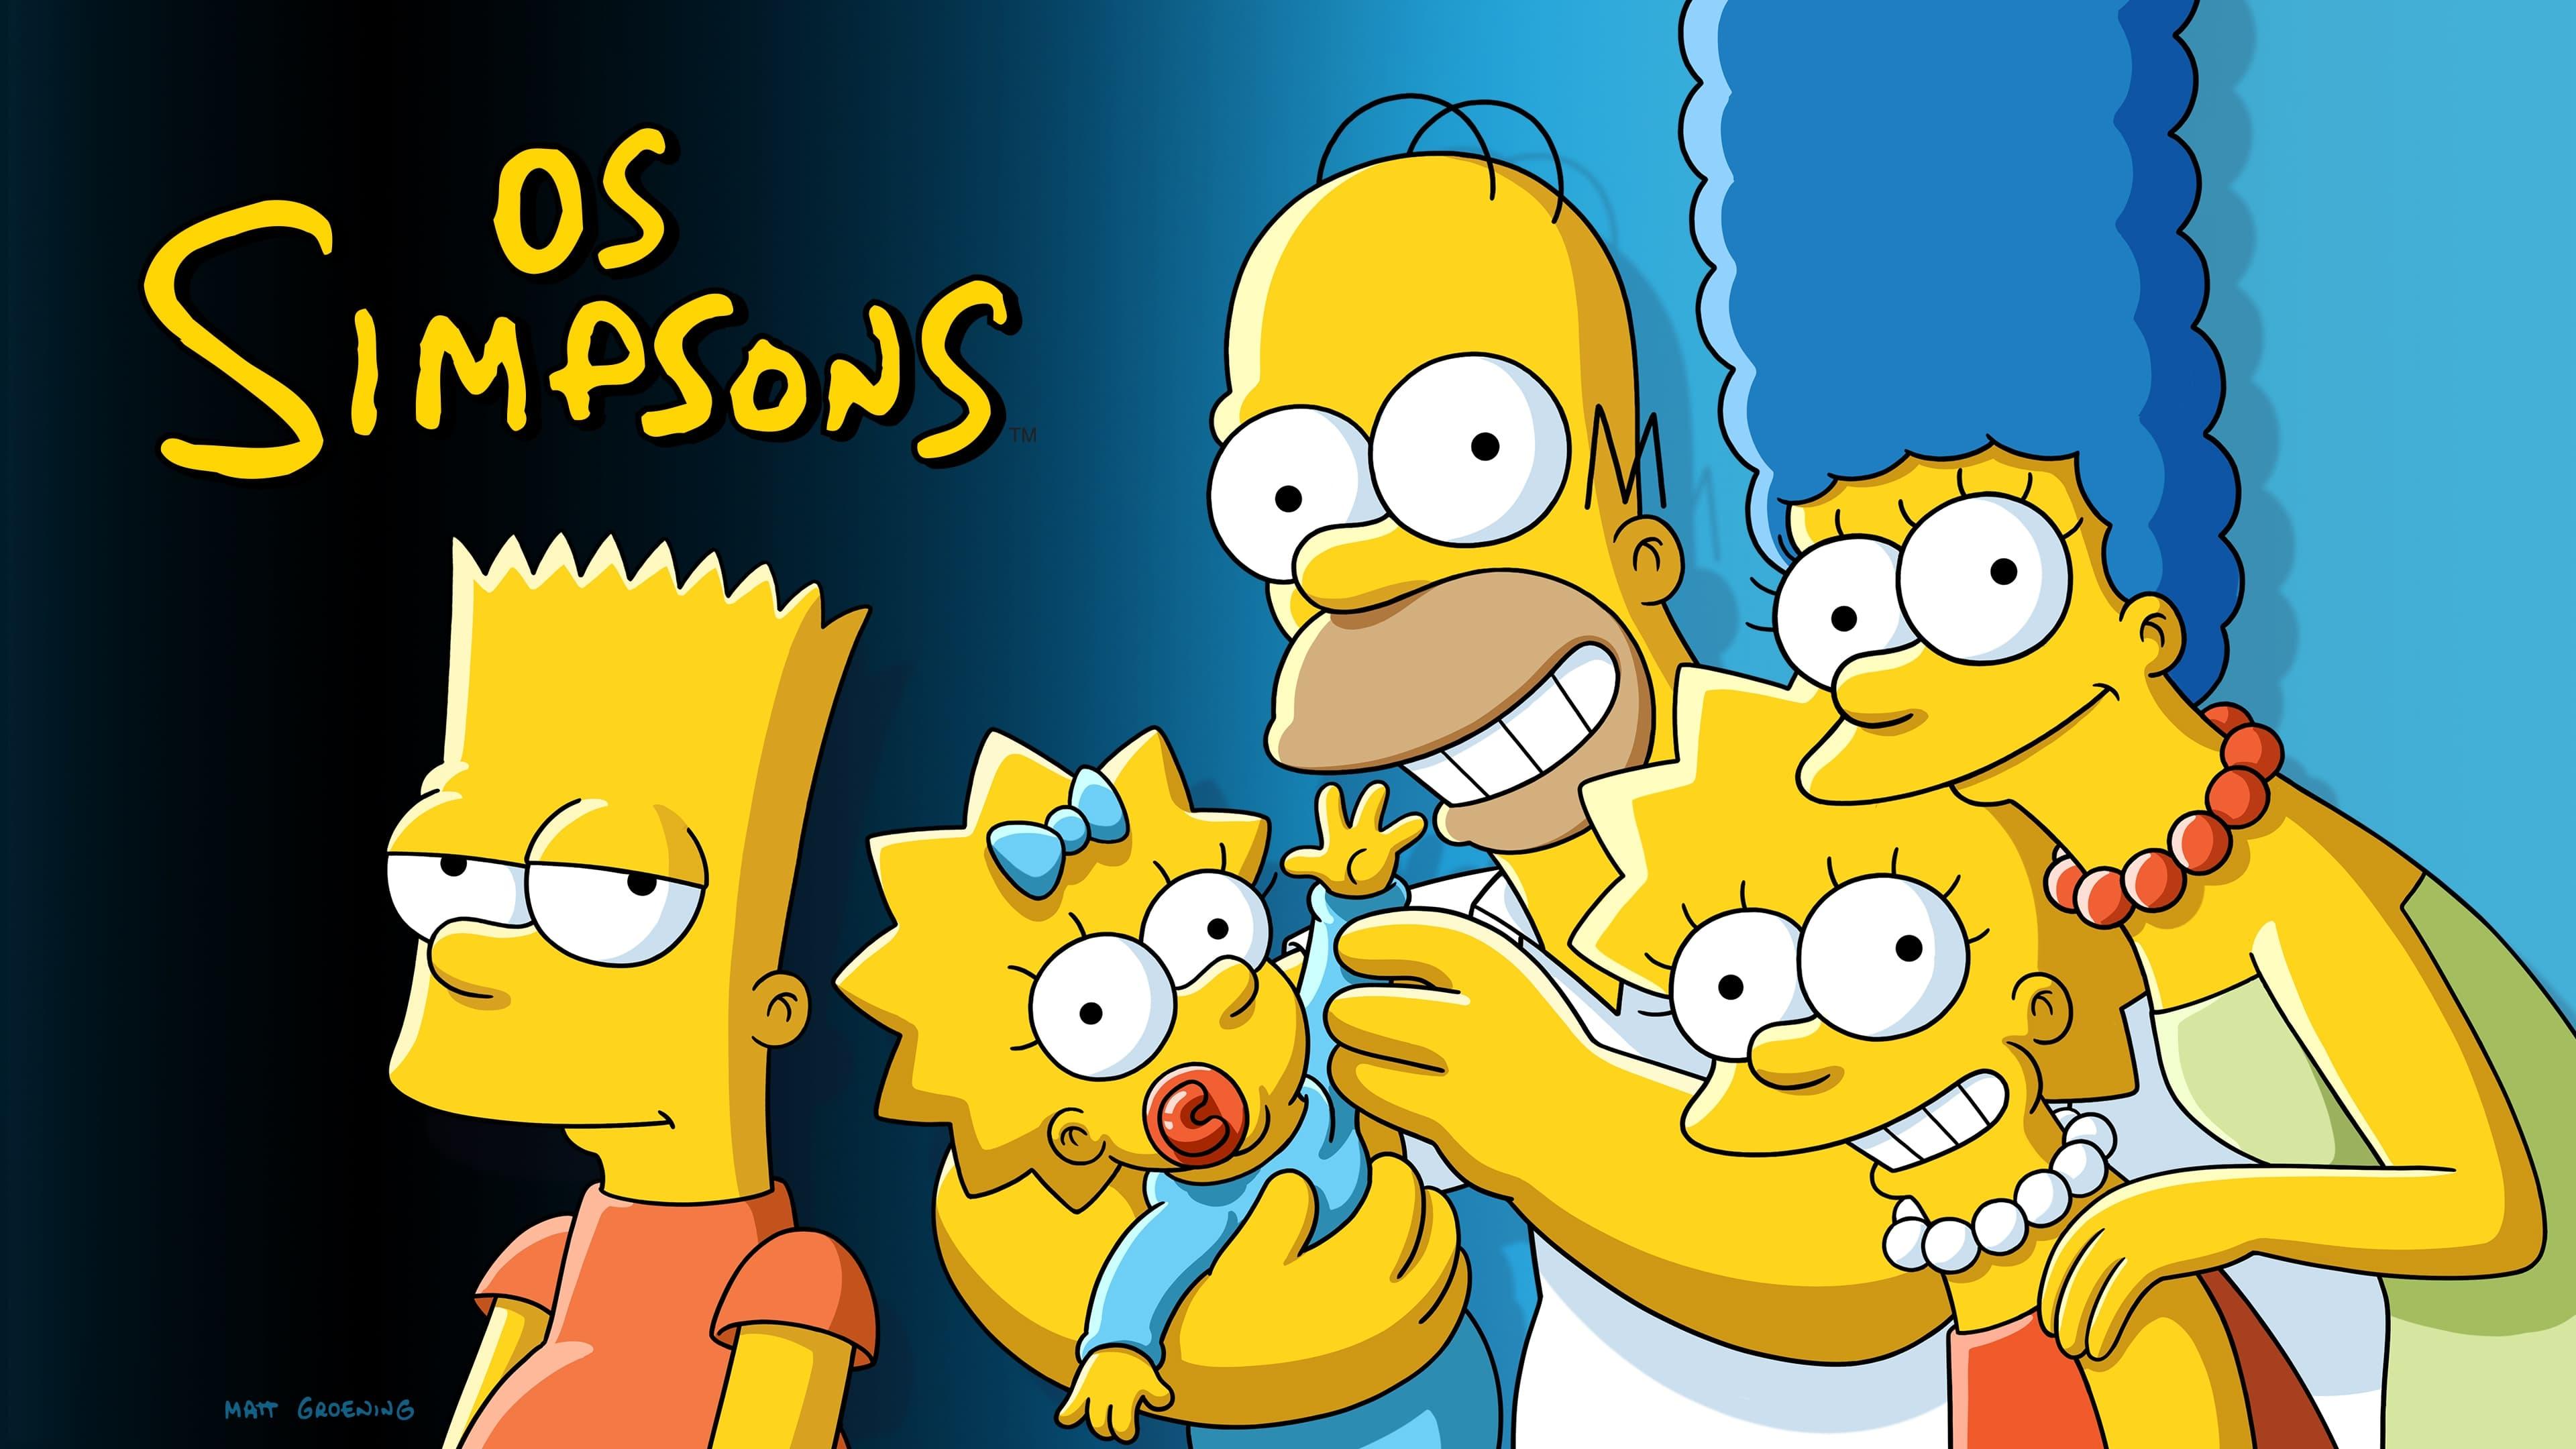 The Simpsons - Season 5 (1970)